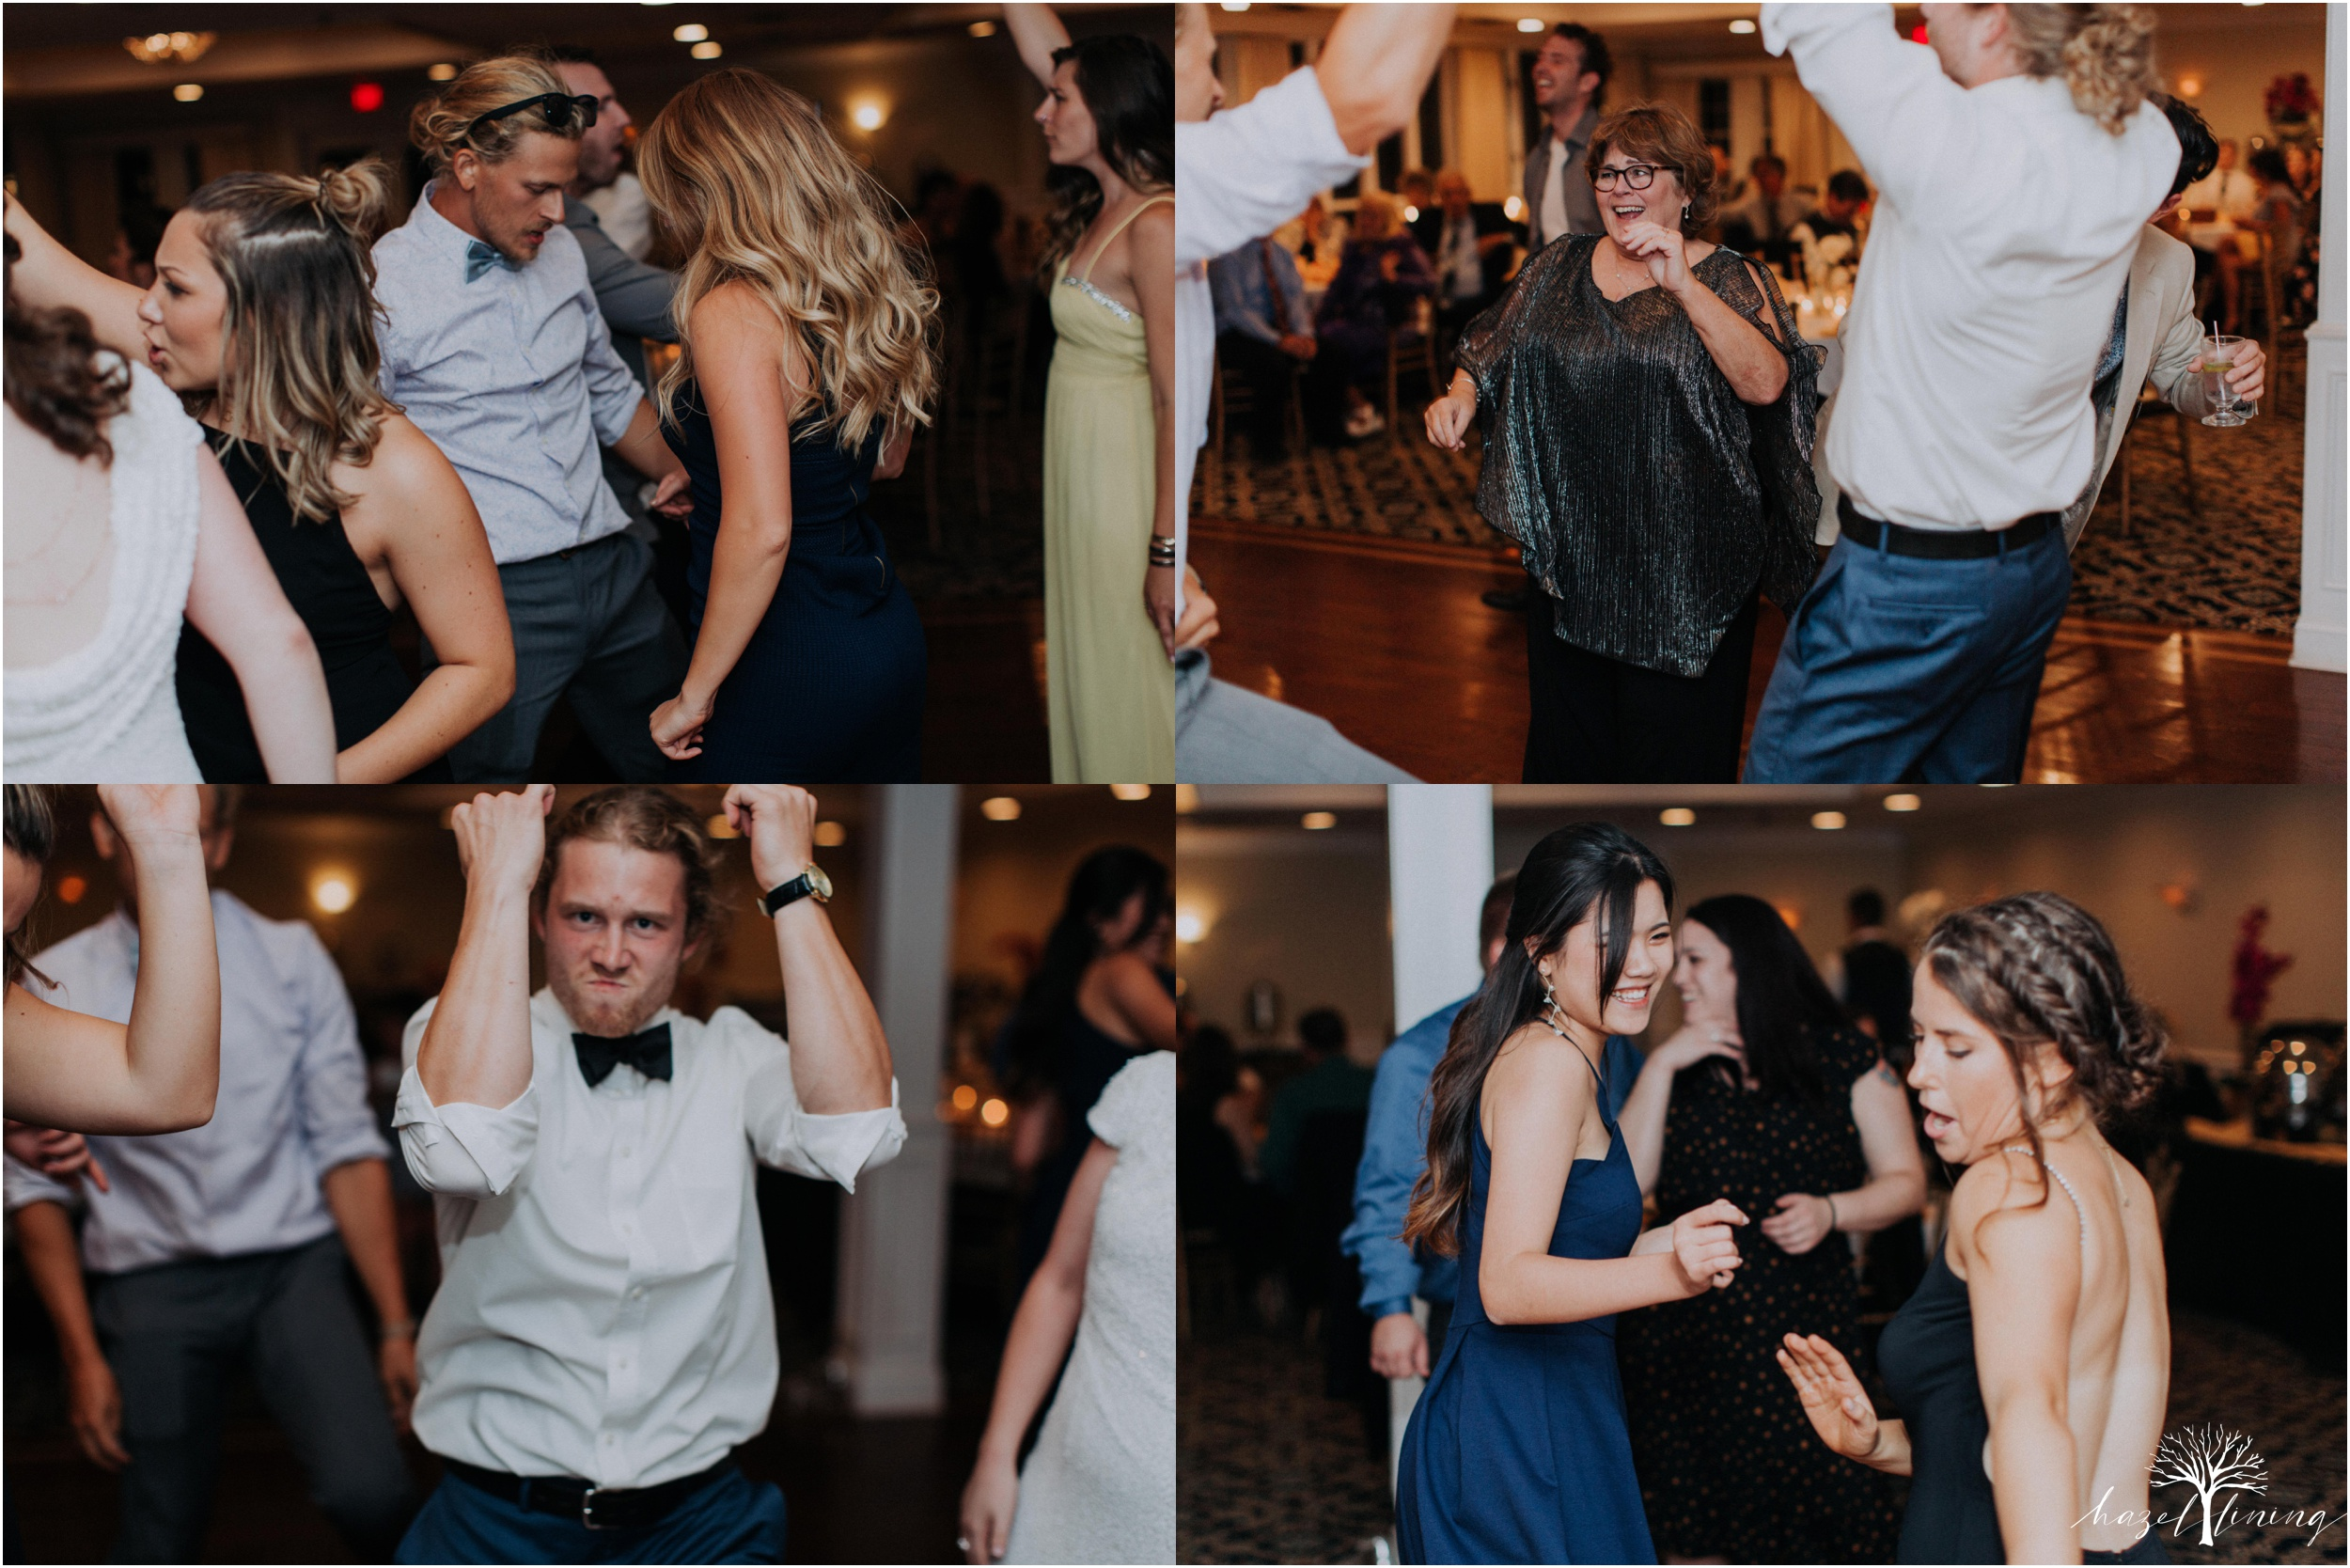 elizabeth-doelp-andrew-foreback-middletown-country-club-summer-langhorne-pennsylvania-wedding-hazel-lining-travel-wedding-elopement-photography_0162.jpg